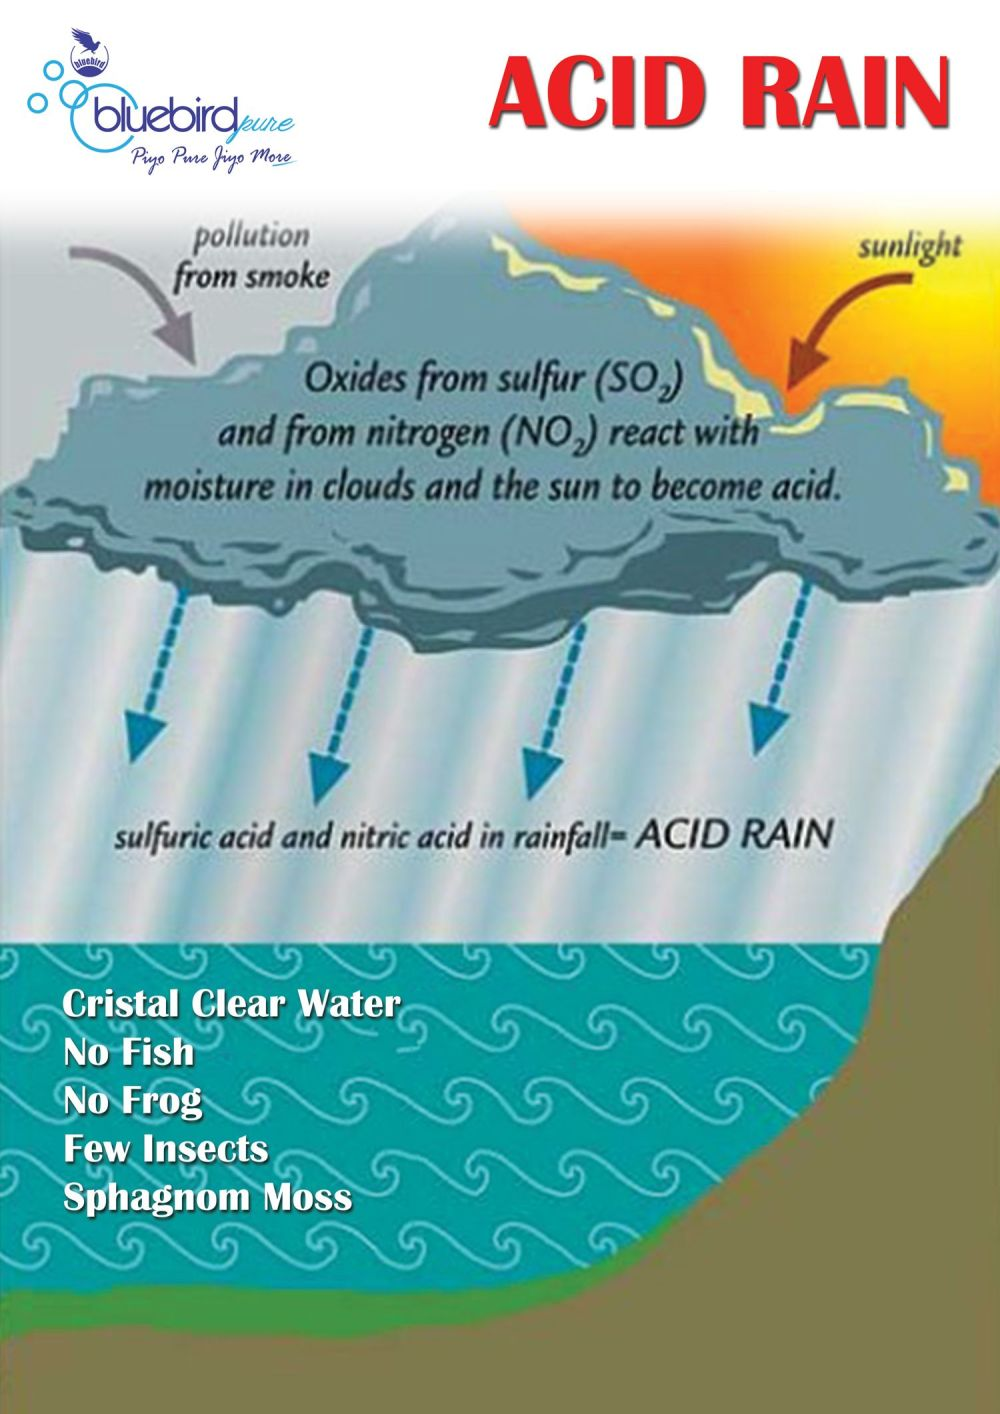 medium resolution of acid rain easy diagram wiring diagram autovehicle acid rain easy diagram